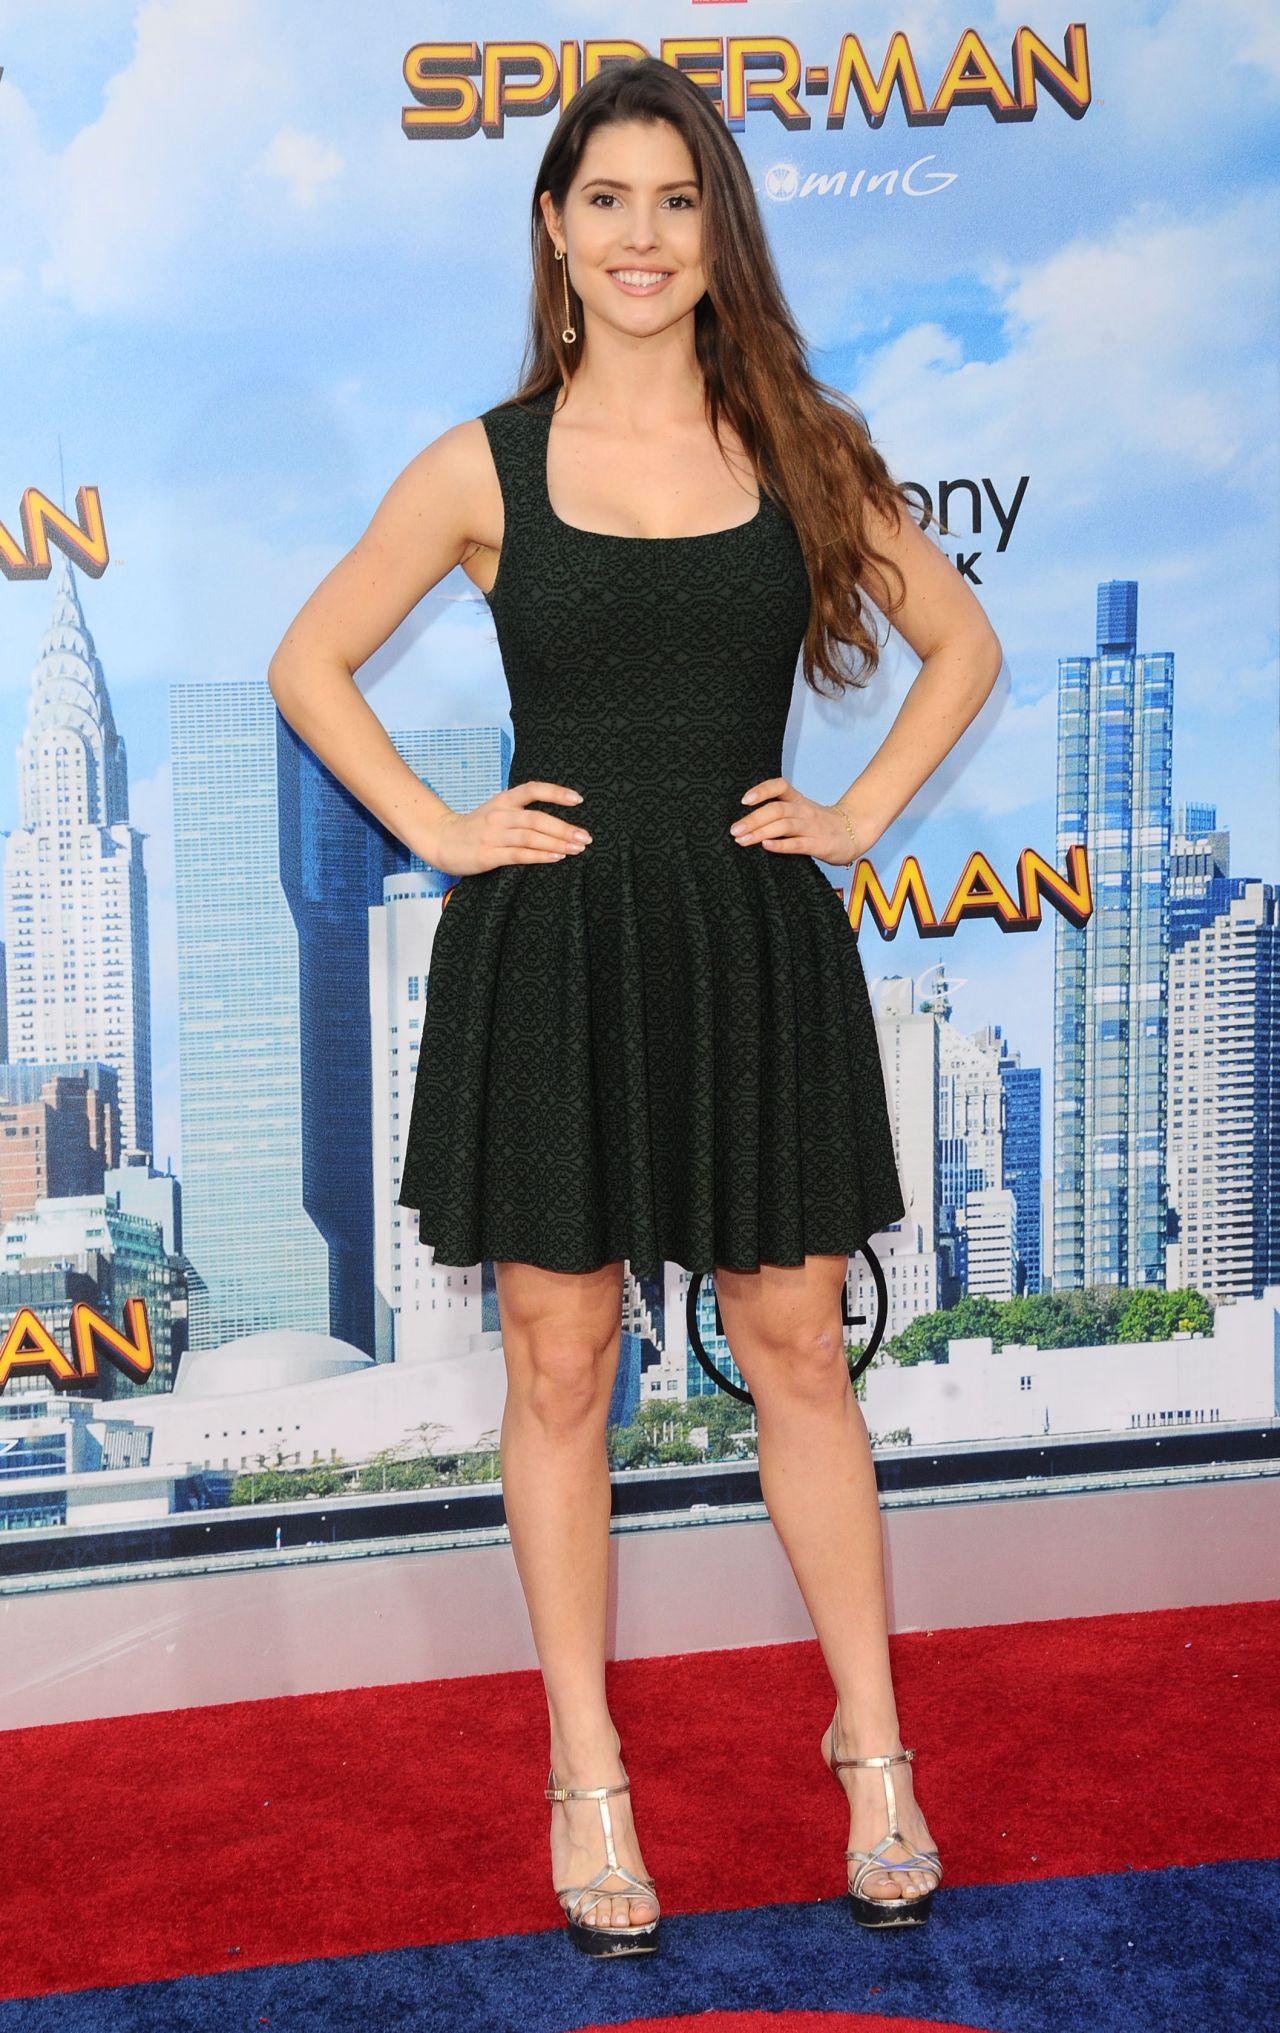 ¿Cuánto mide Amanda Cerny? - Real height Amanda-cerny-spider-man-homecoming-premiere-in-hollywood-06-28-2017-6